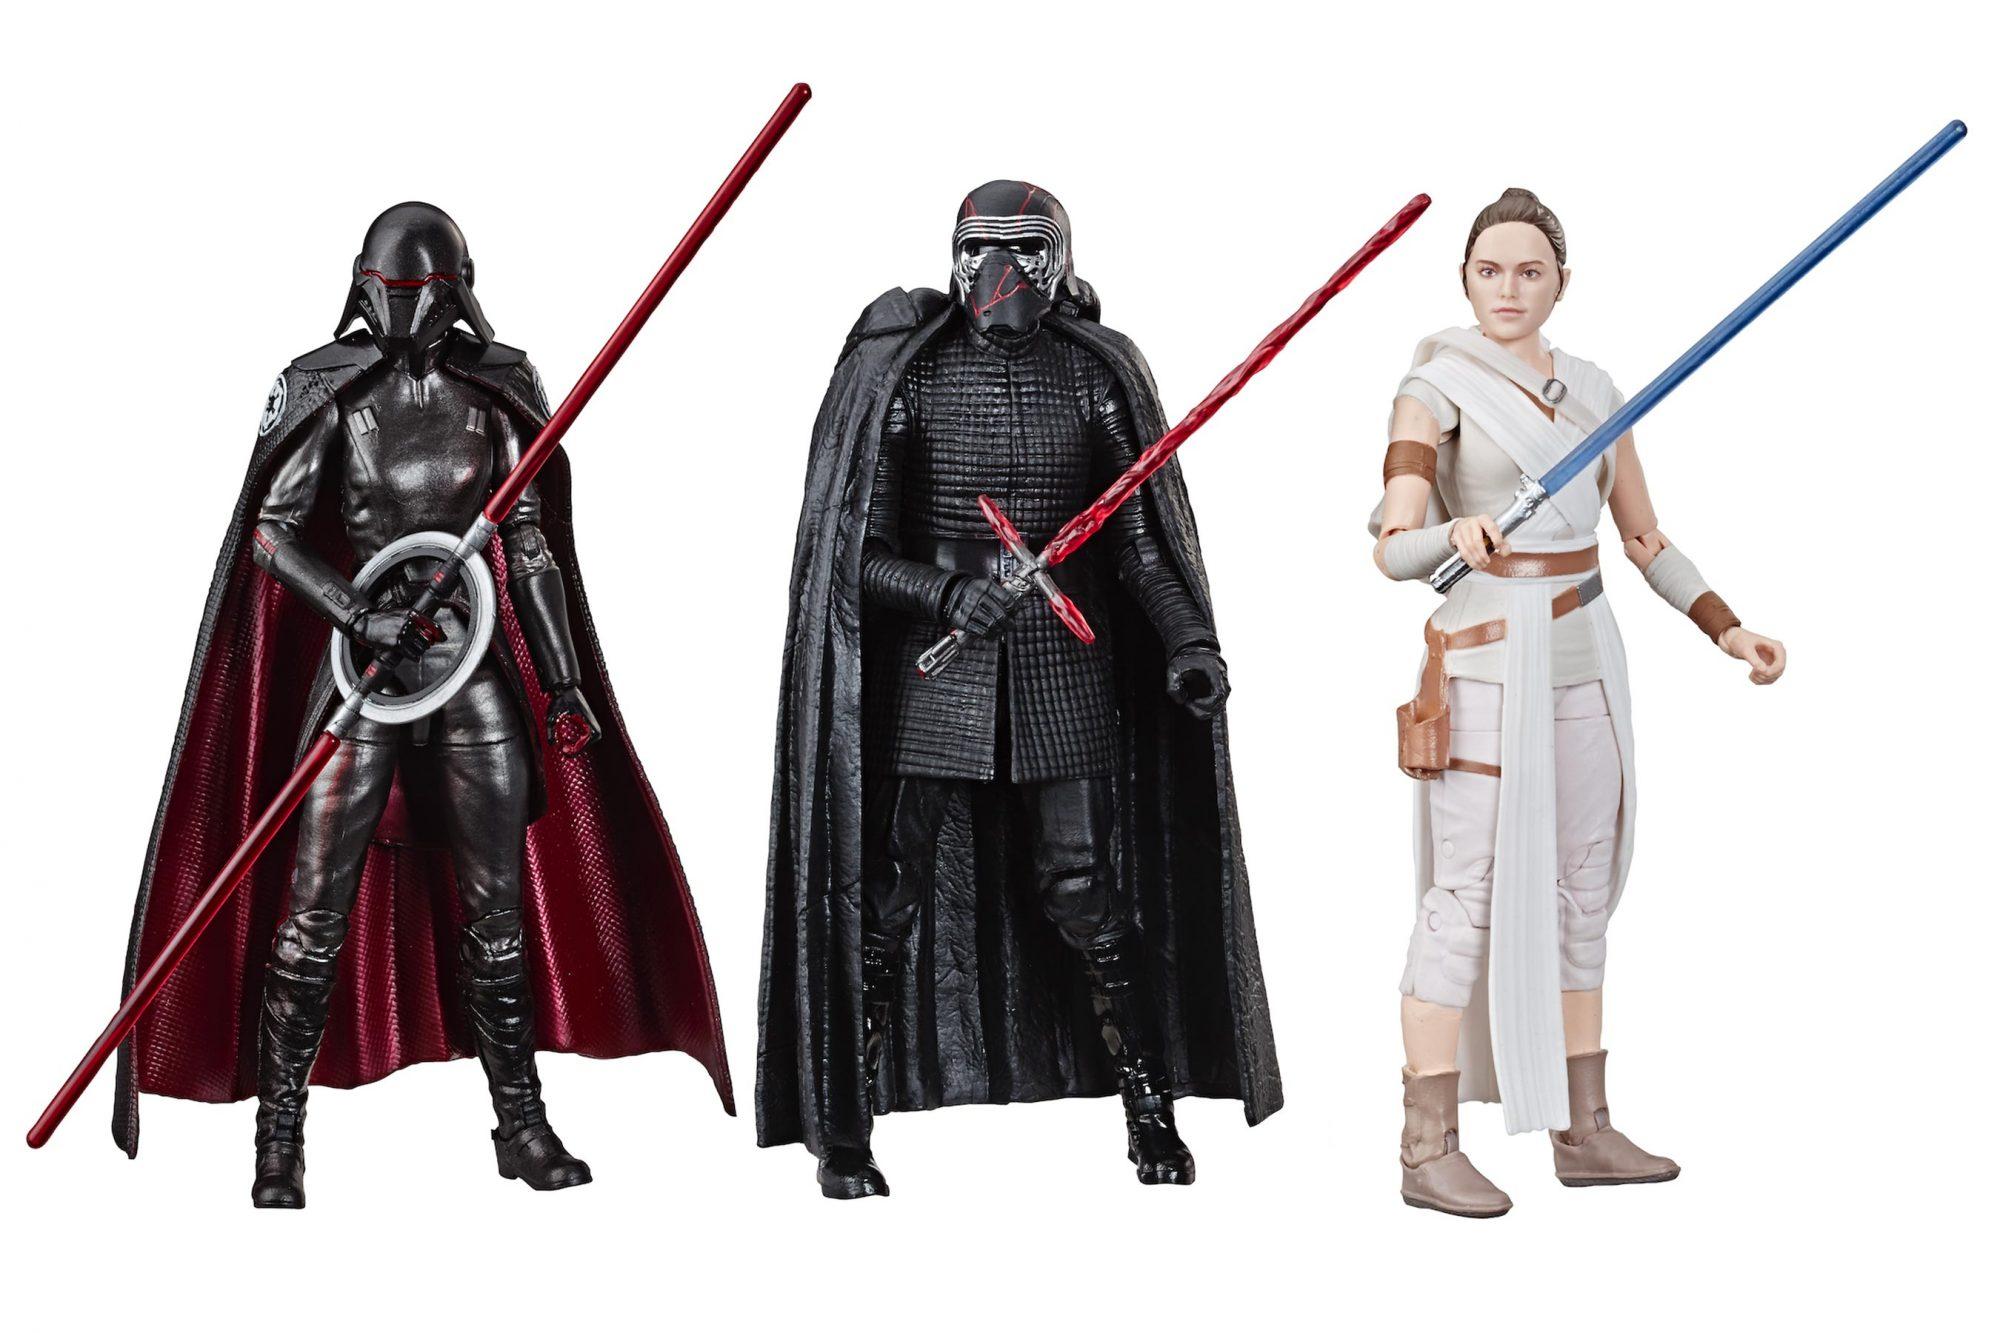 Star Wars The Rise Of Skywalker D23 Expo Footage Breakdown Ew Com